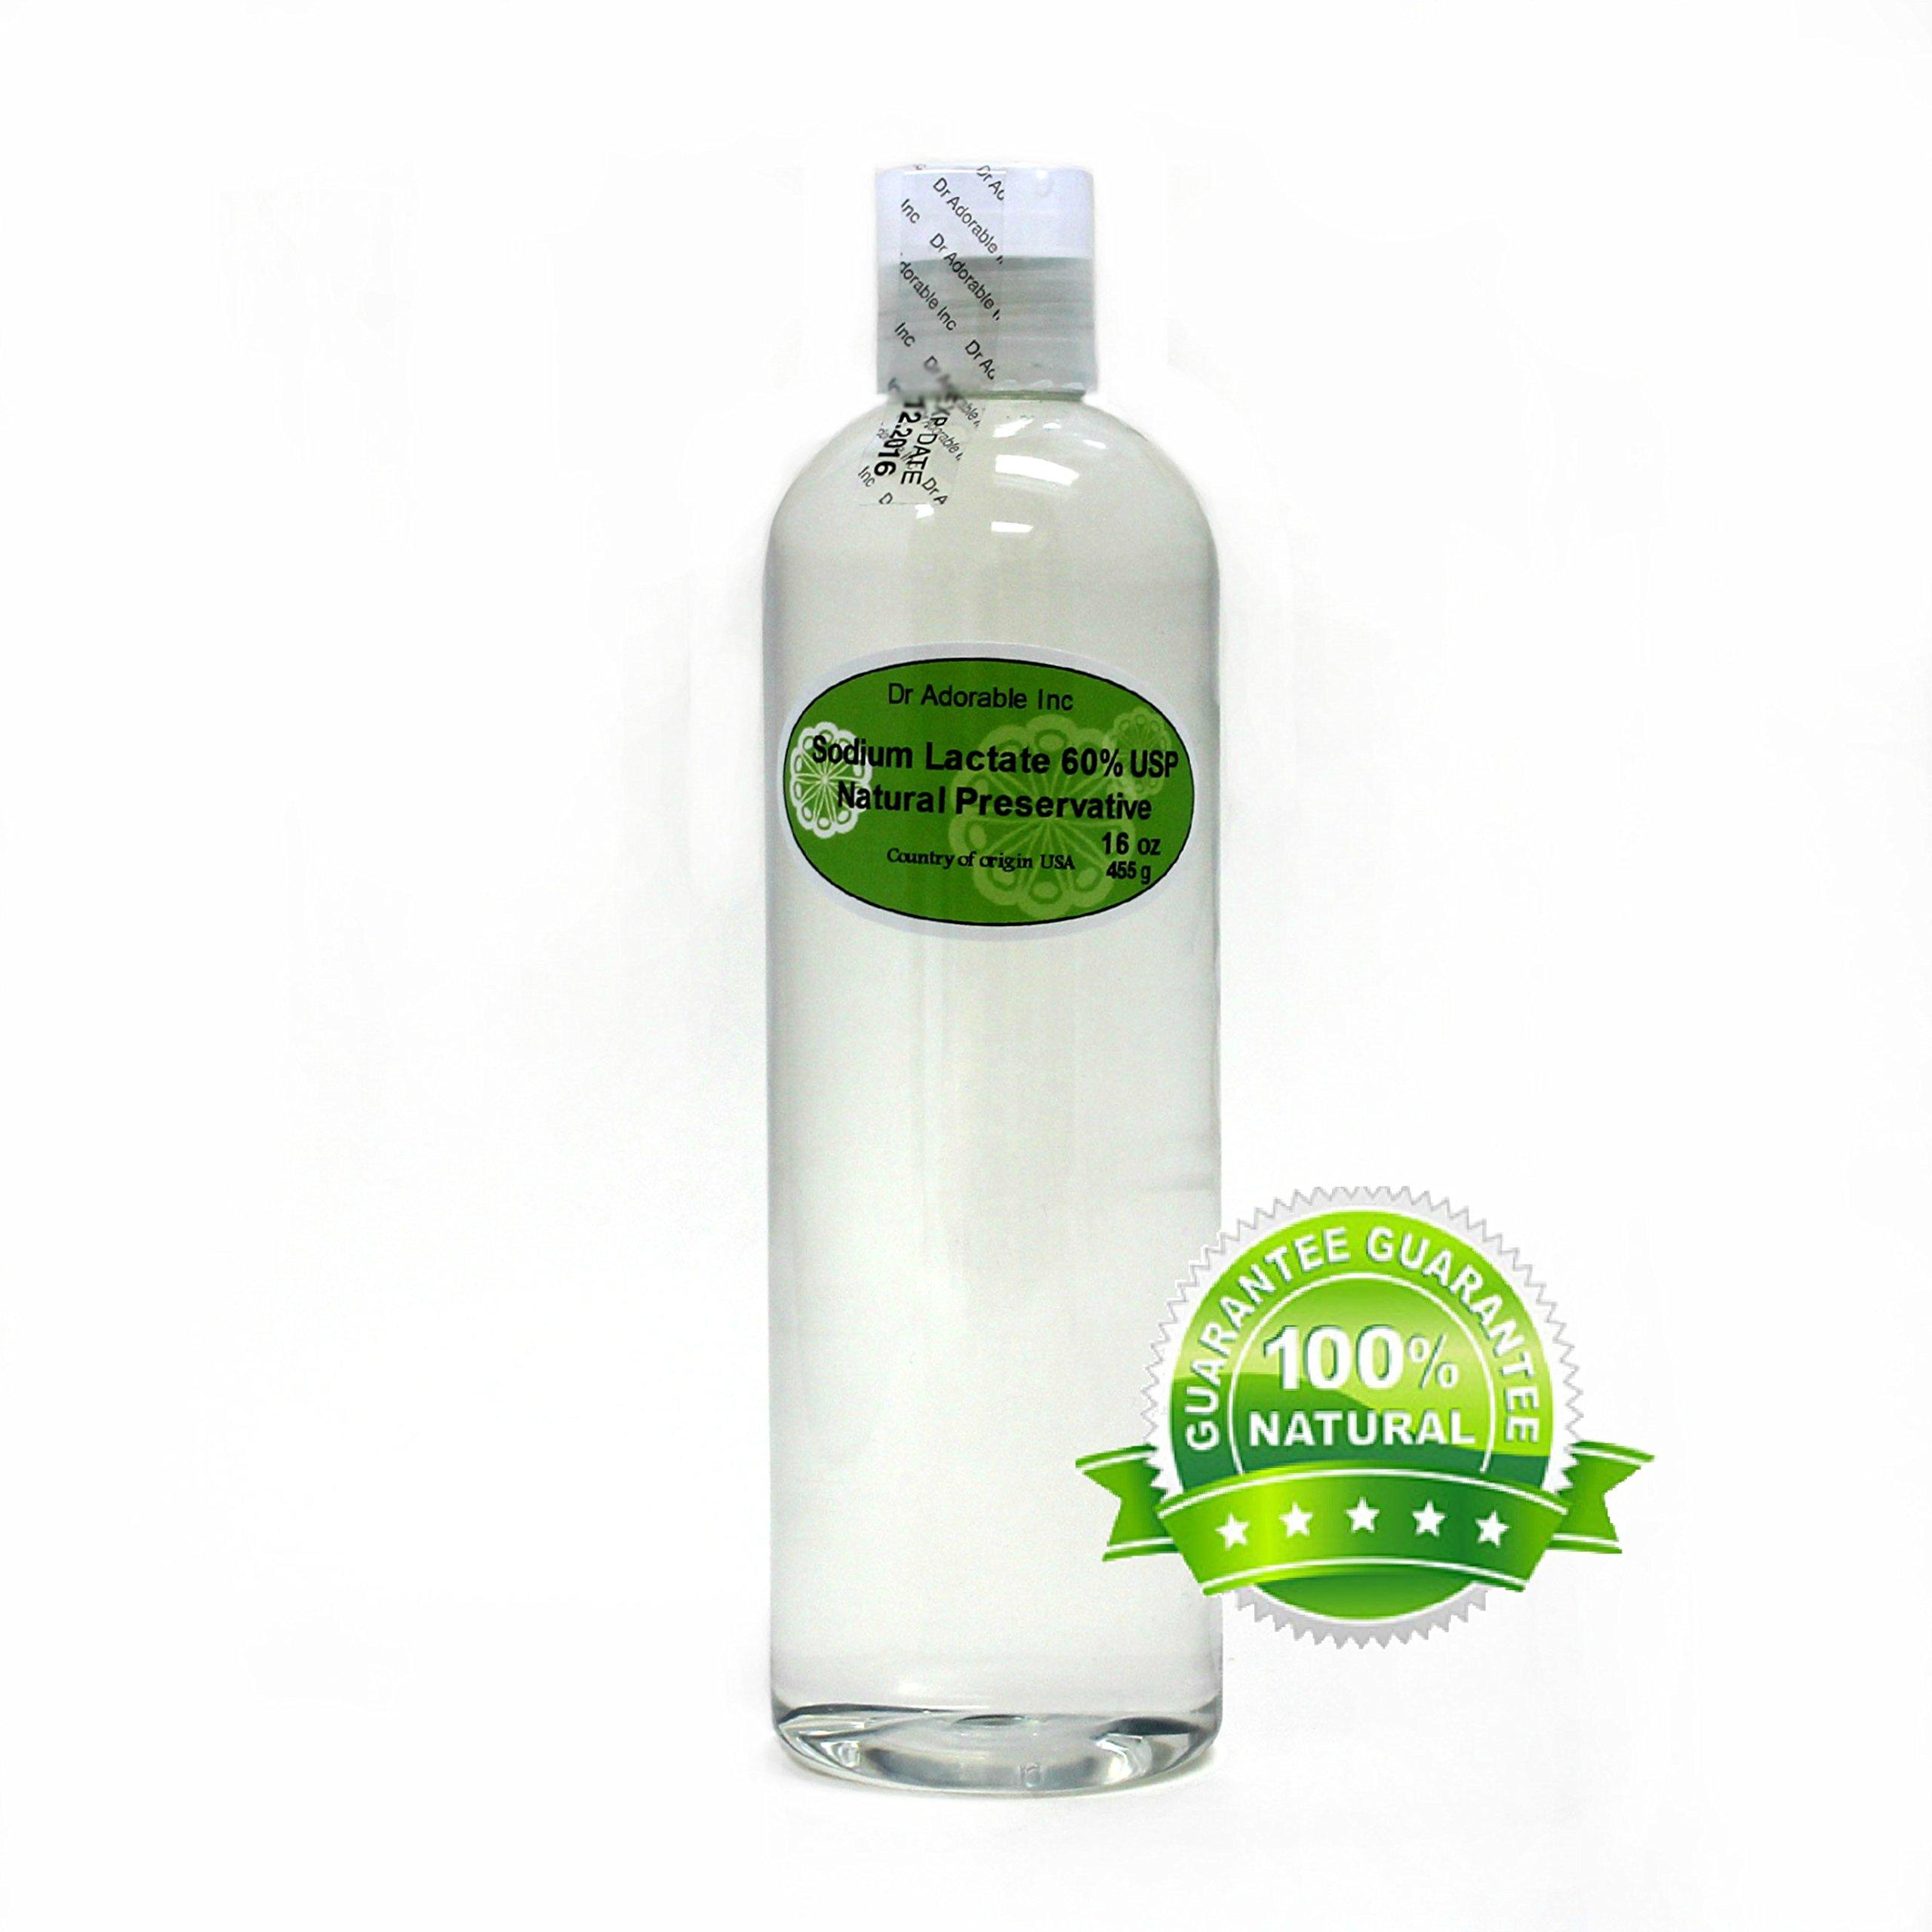 Sodium Lactate 60% USP Natural Preservative 16 oz